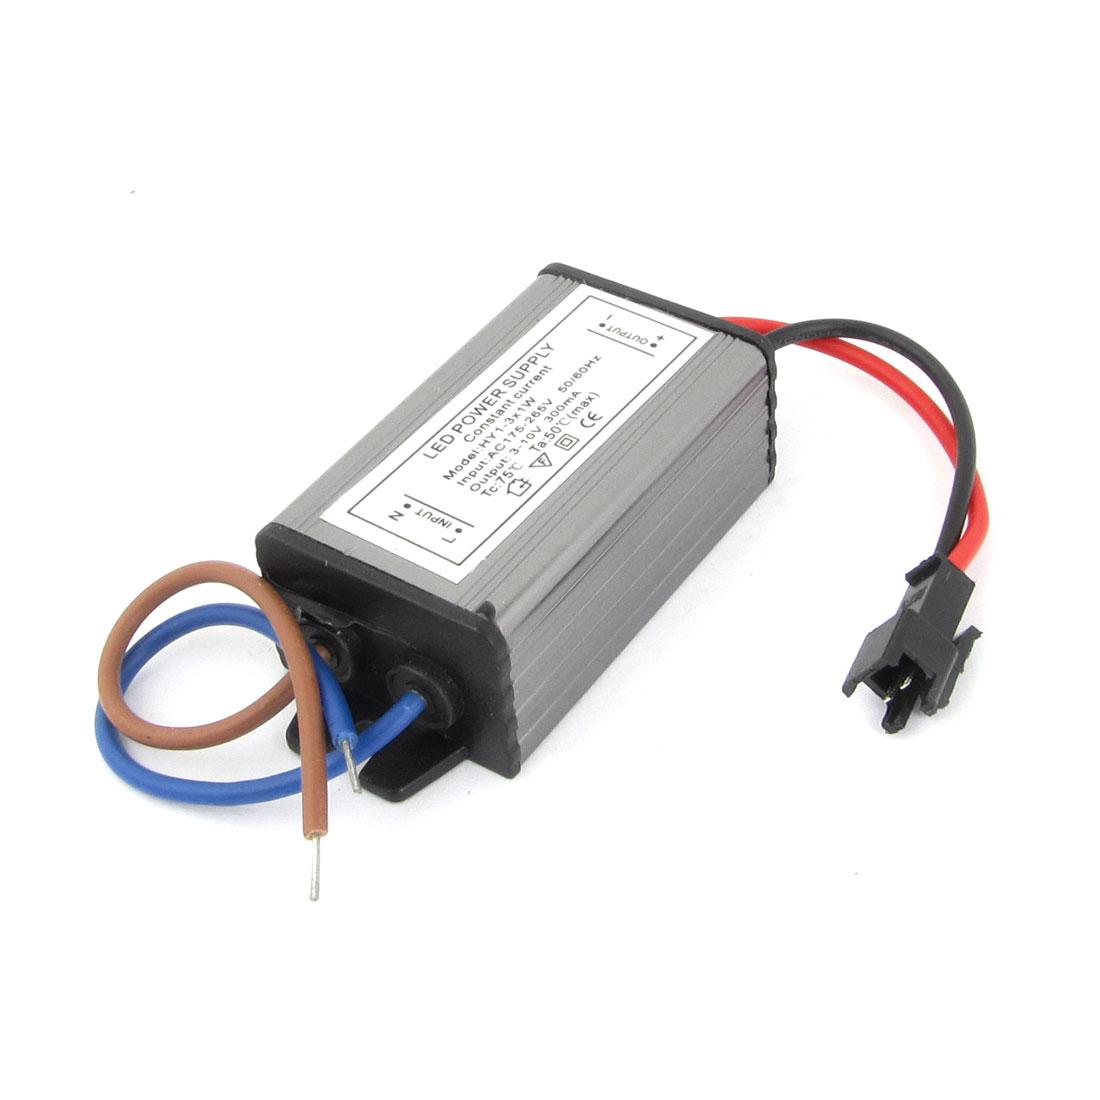 AC 175-265V 3-10V 300mA Aluminum Housing LED Power Supply Driver HY1-3X1W